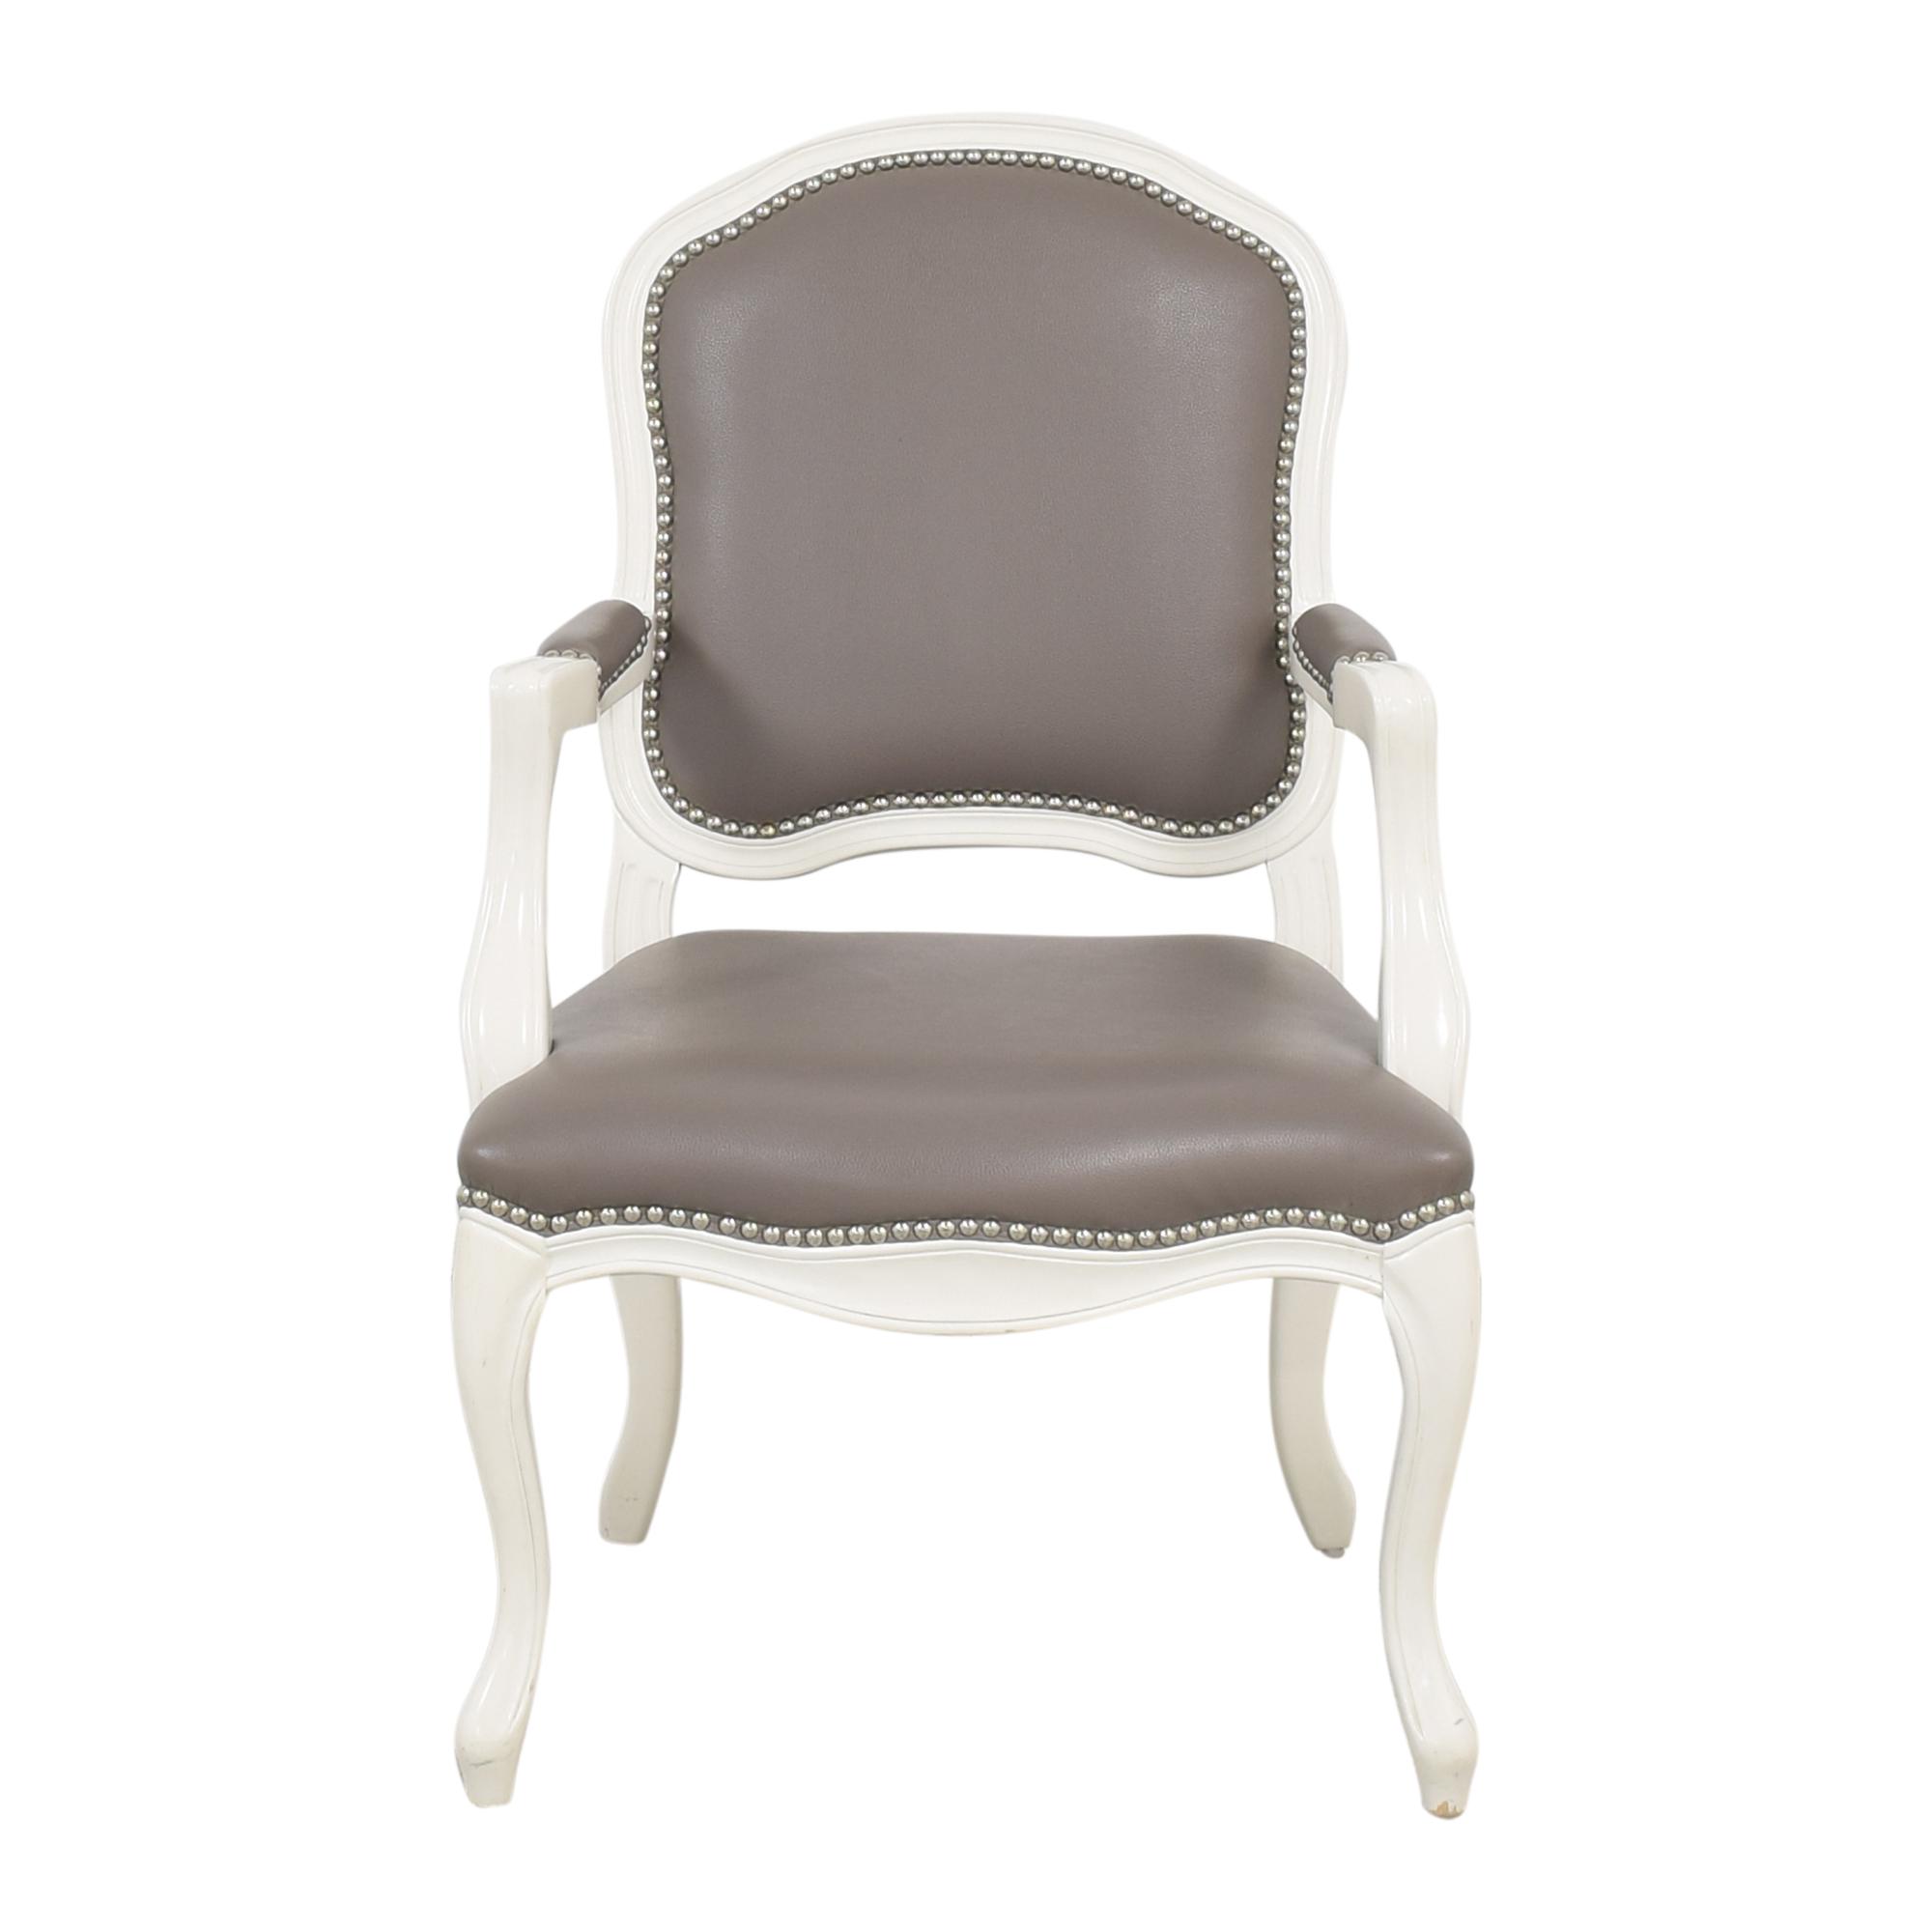 CB2 CB2 Stick Around Arm Chair by Novogratz pa